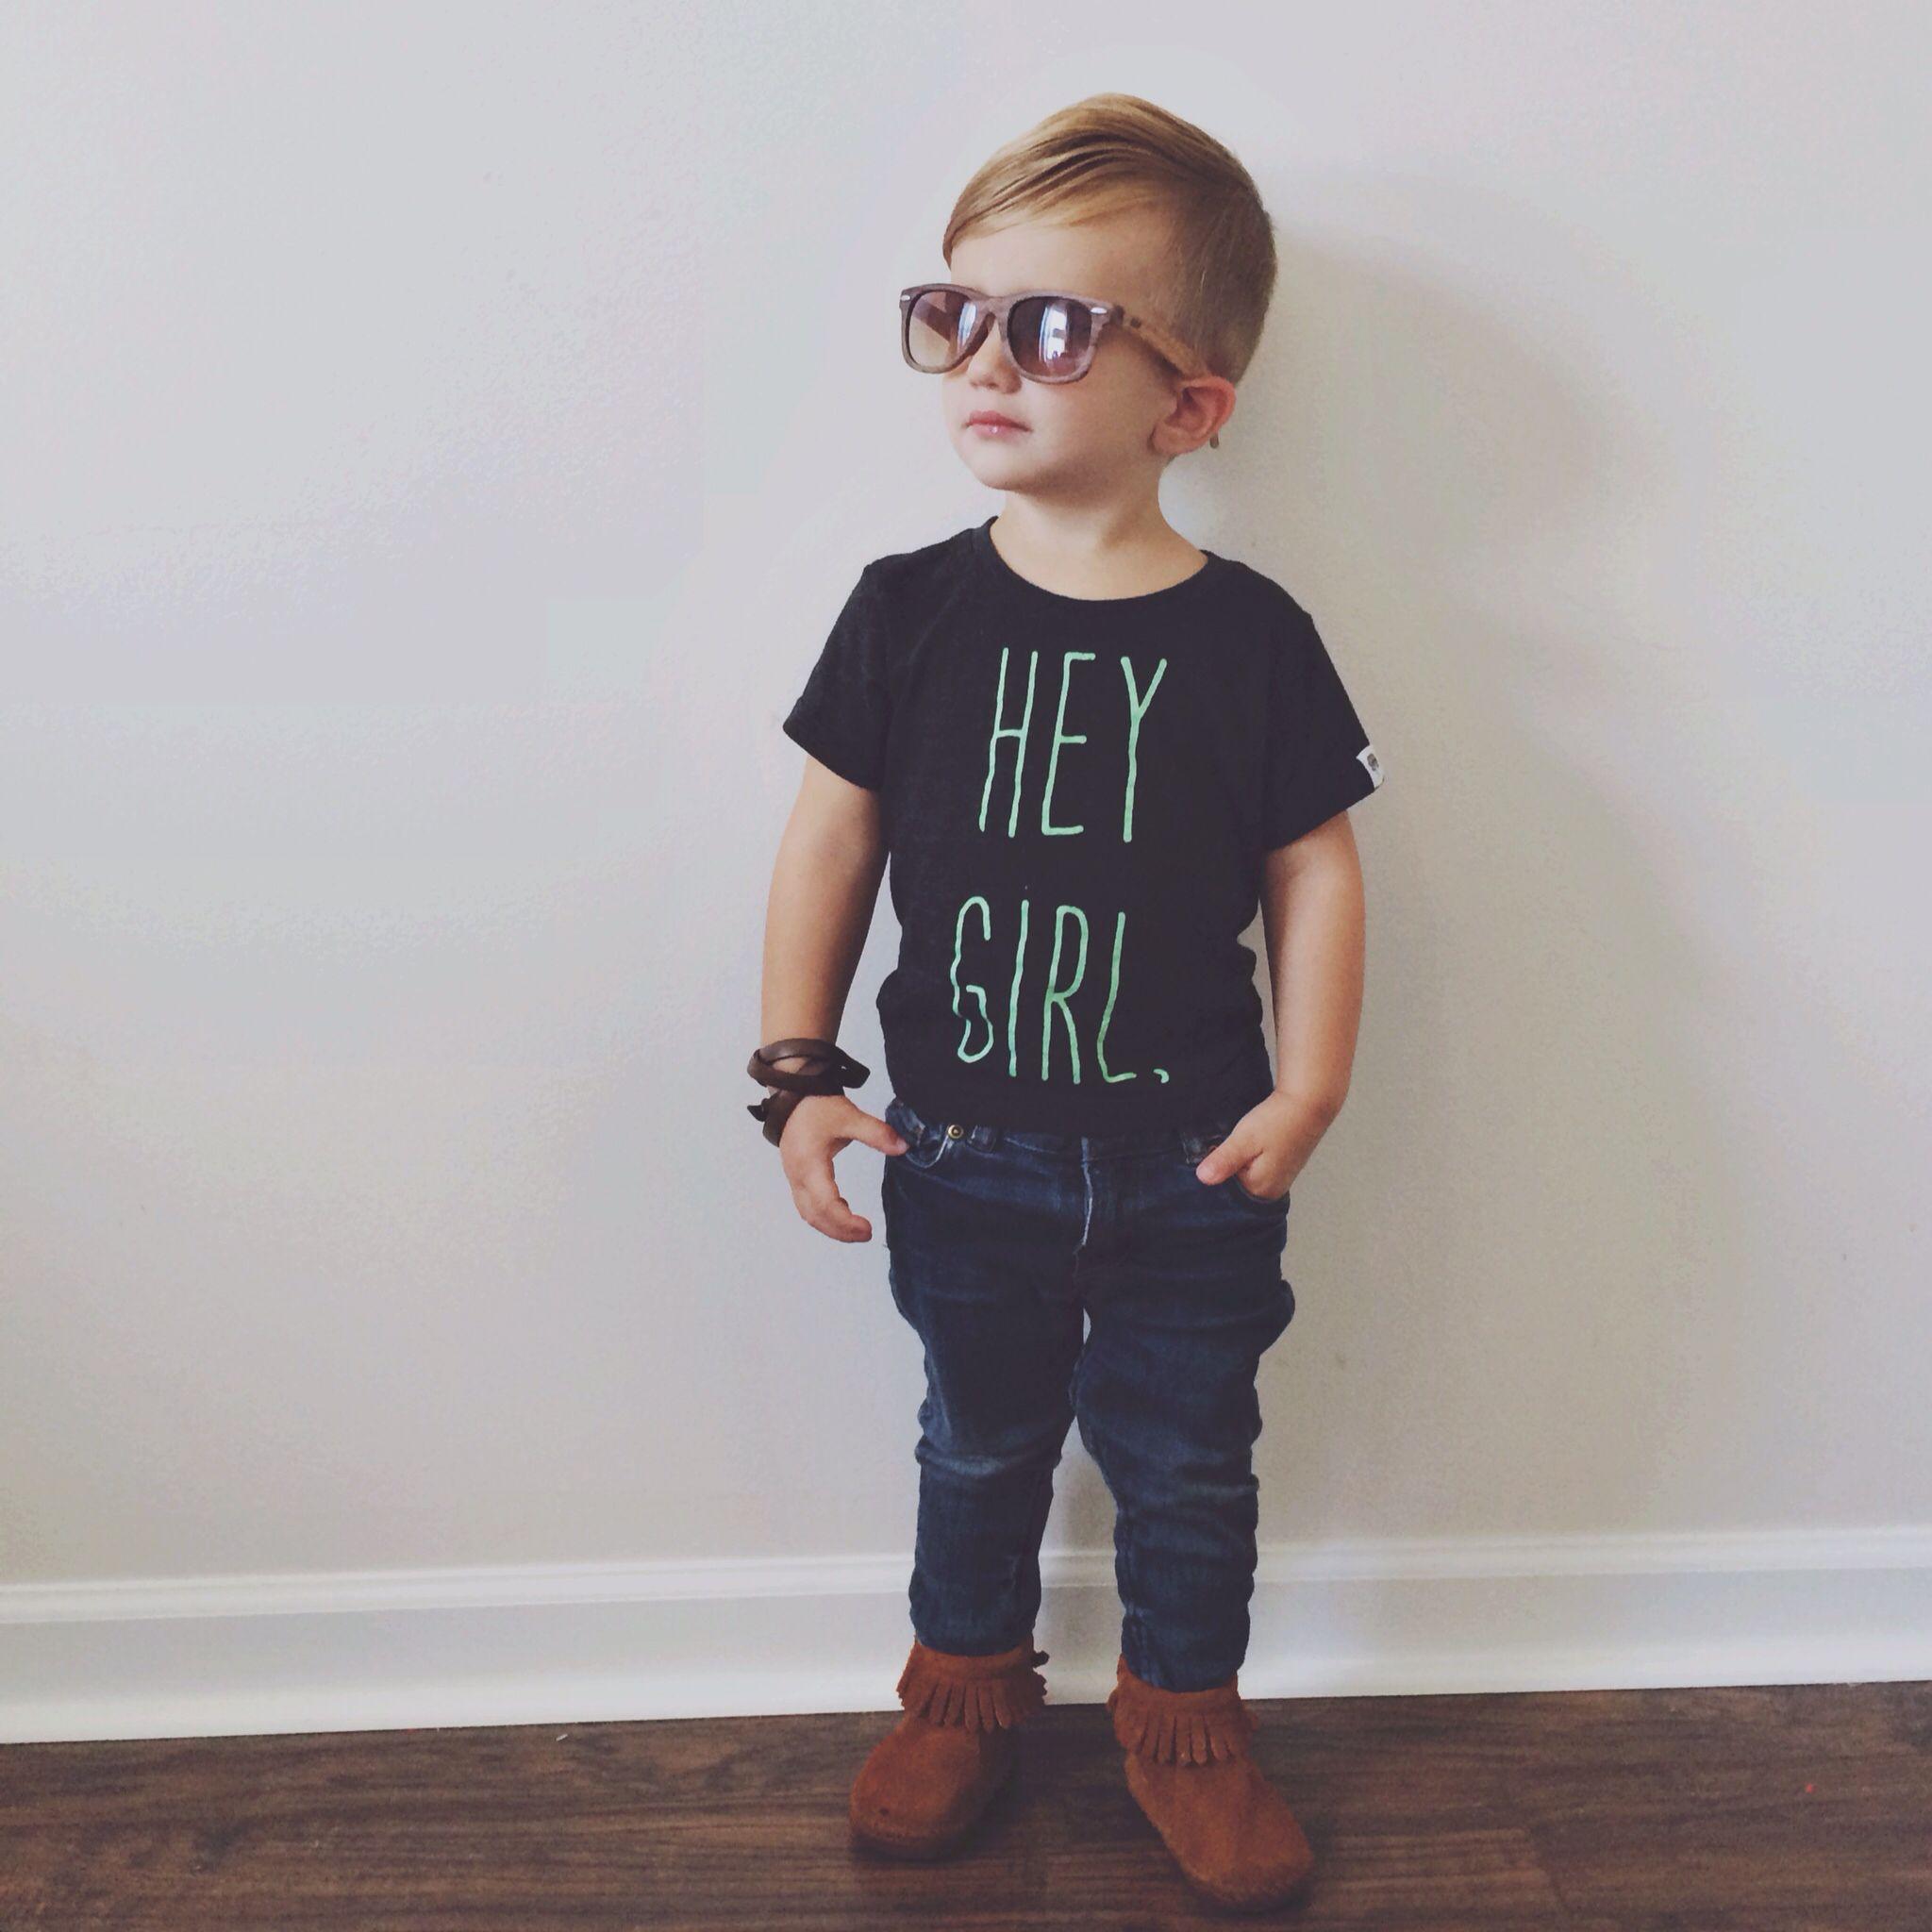 d6c52f8e78833 Baby boy fashion via sarahknuth on Instagram. Trajes Para Niños